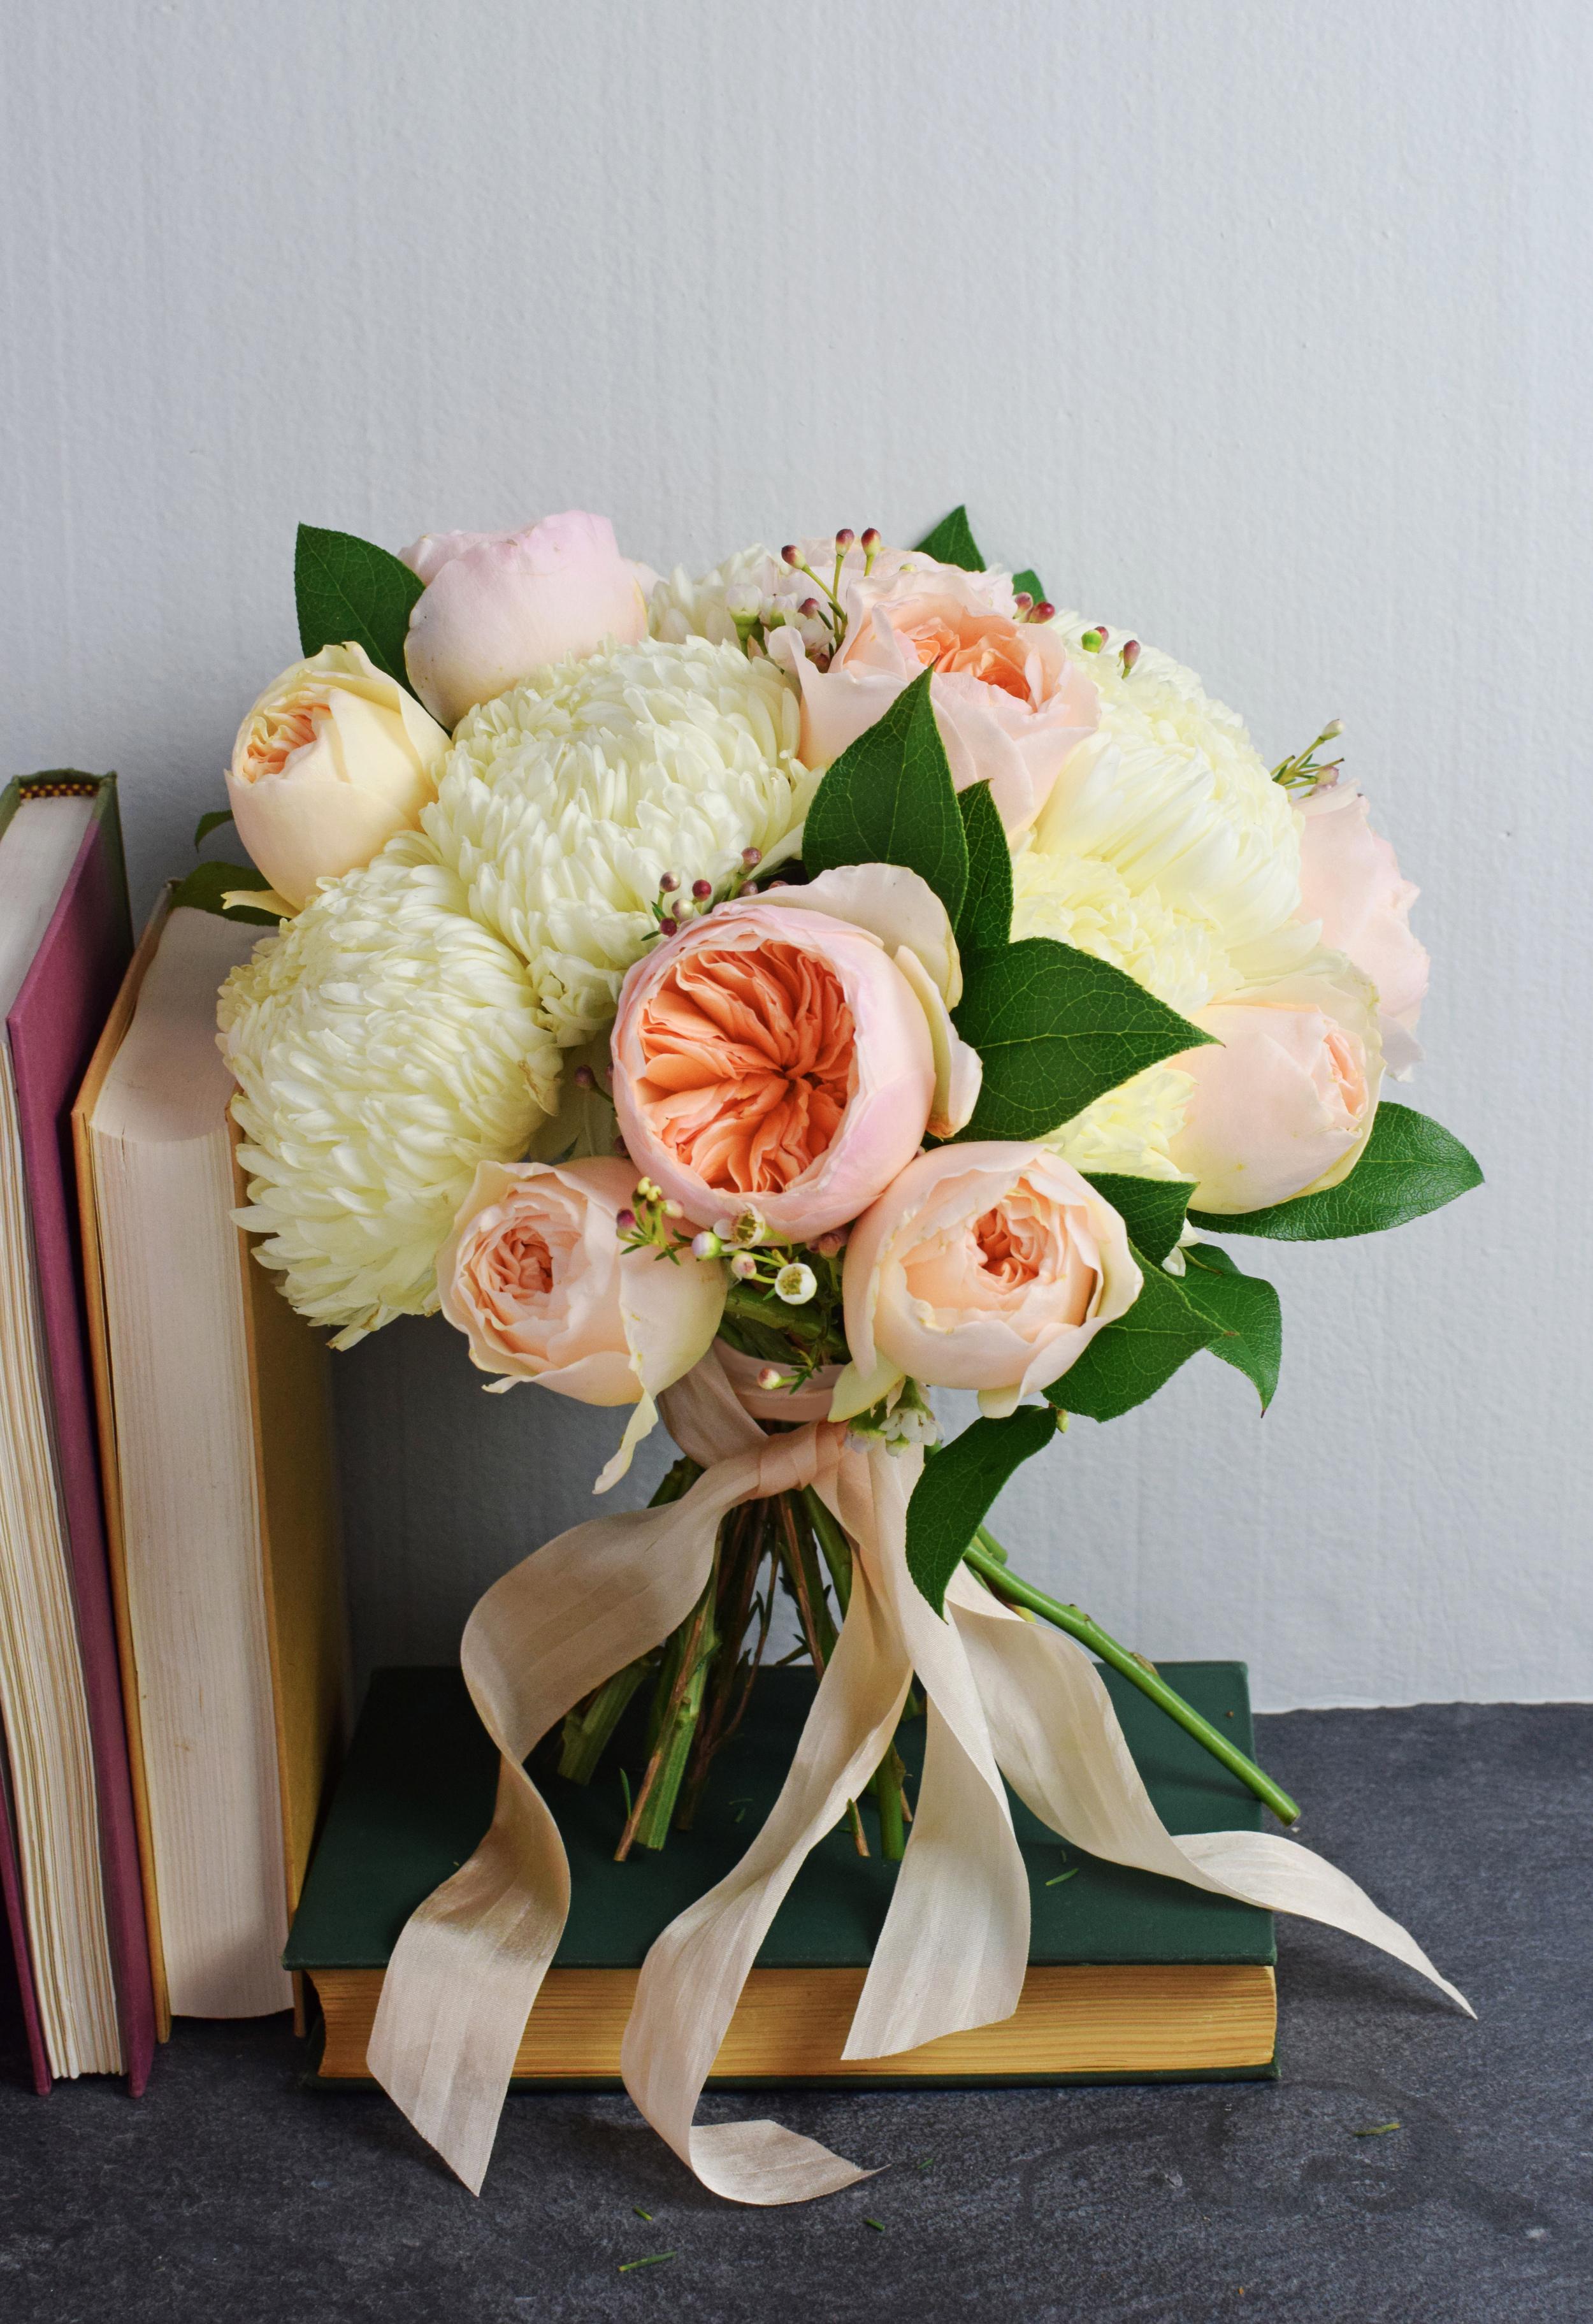 FlowerMoxiediybide_peach2.jpg